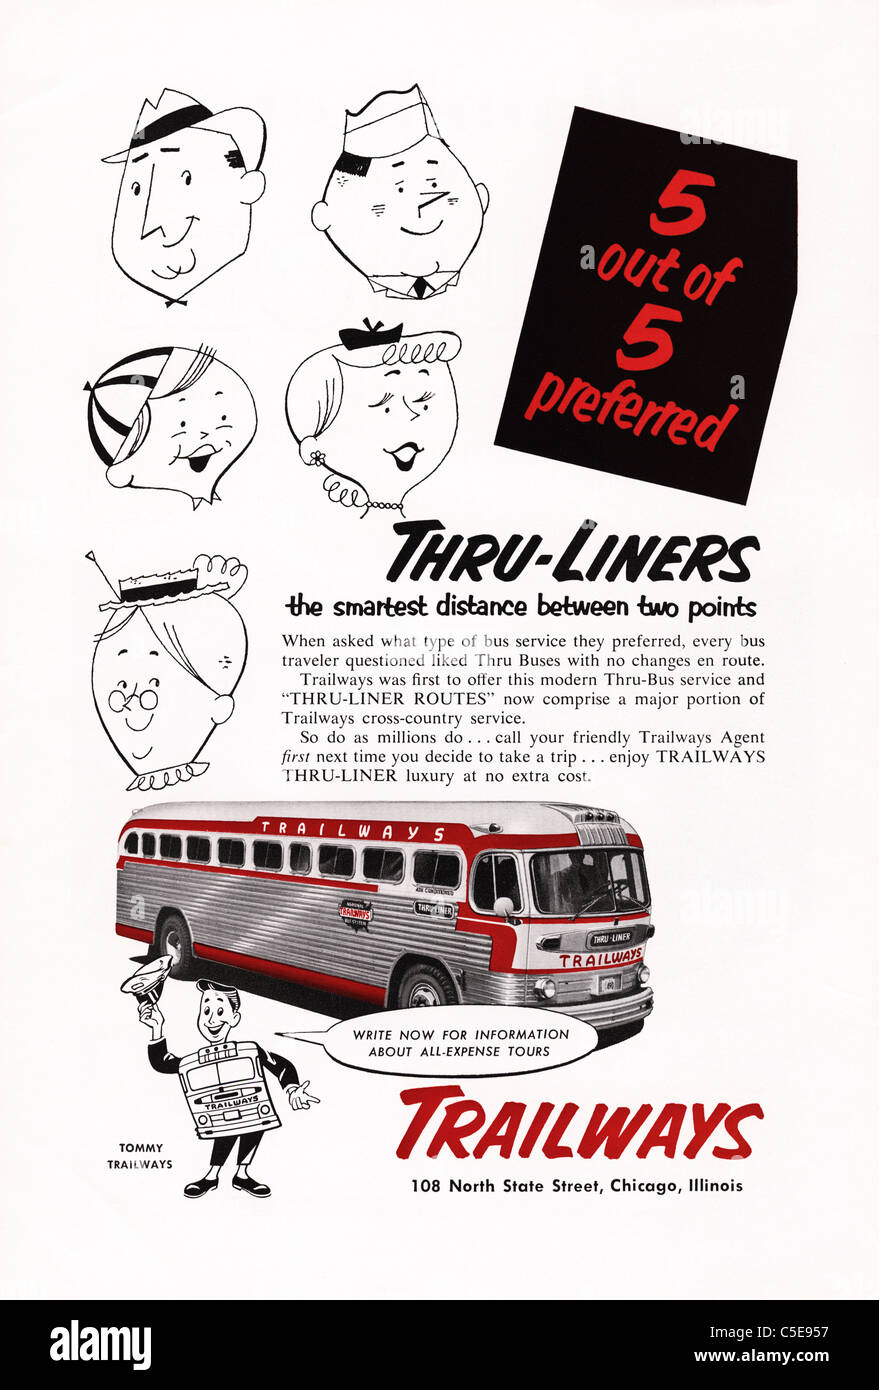 Original 1950s advert in American magazine advertising TRAILWAYS bus service - Stock Image